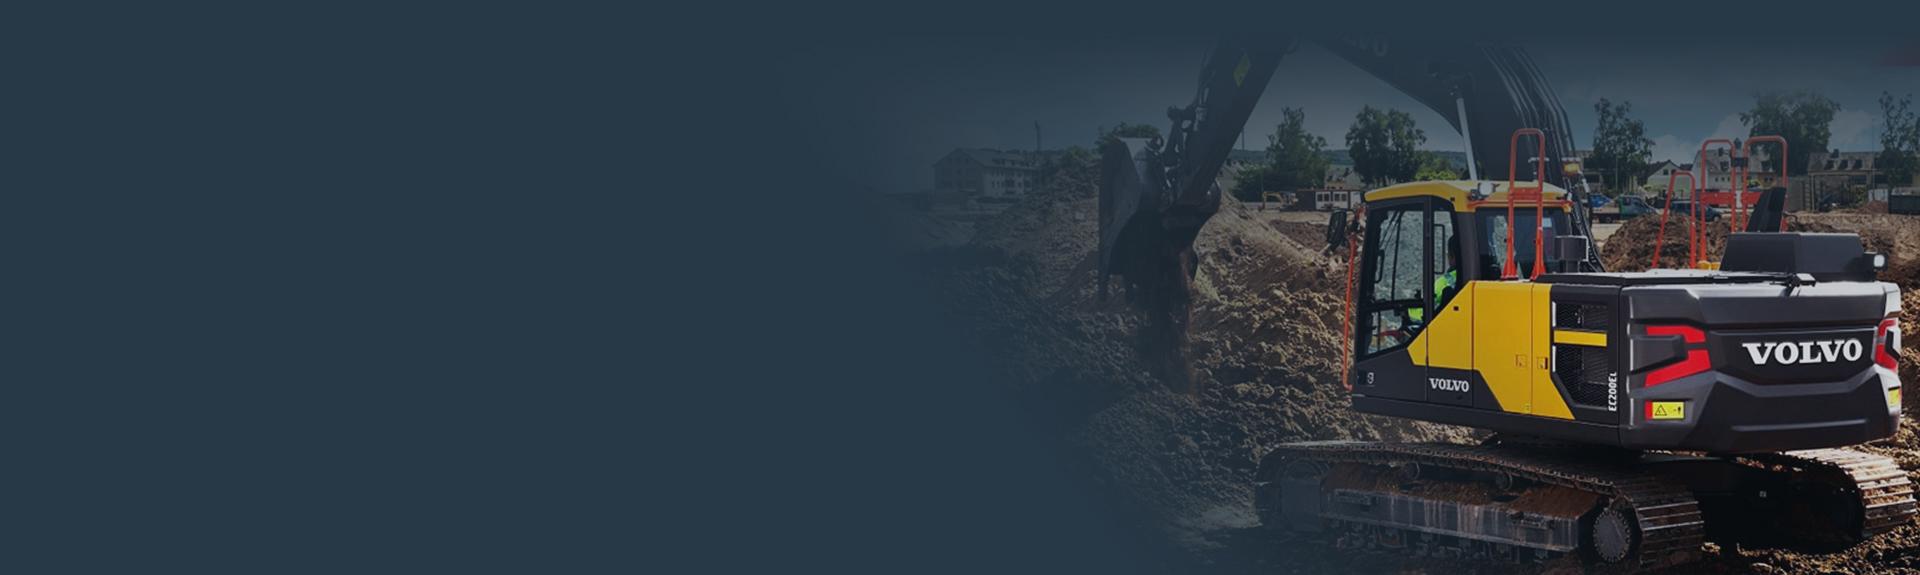 Used Volvo Construction Equipment